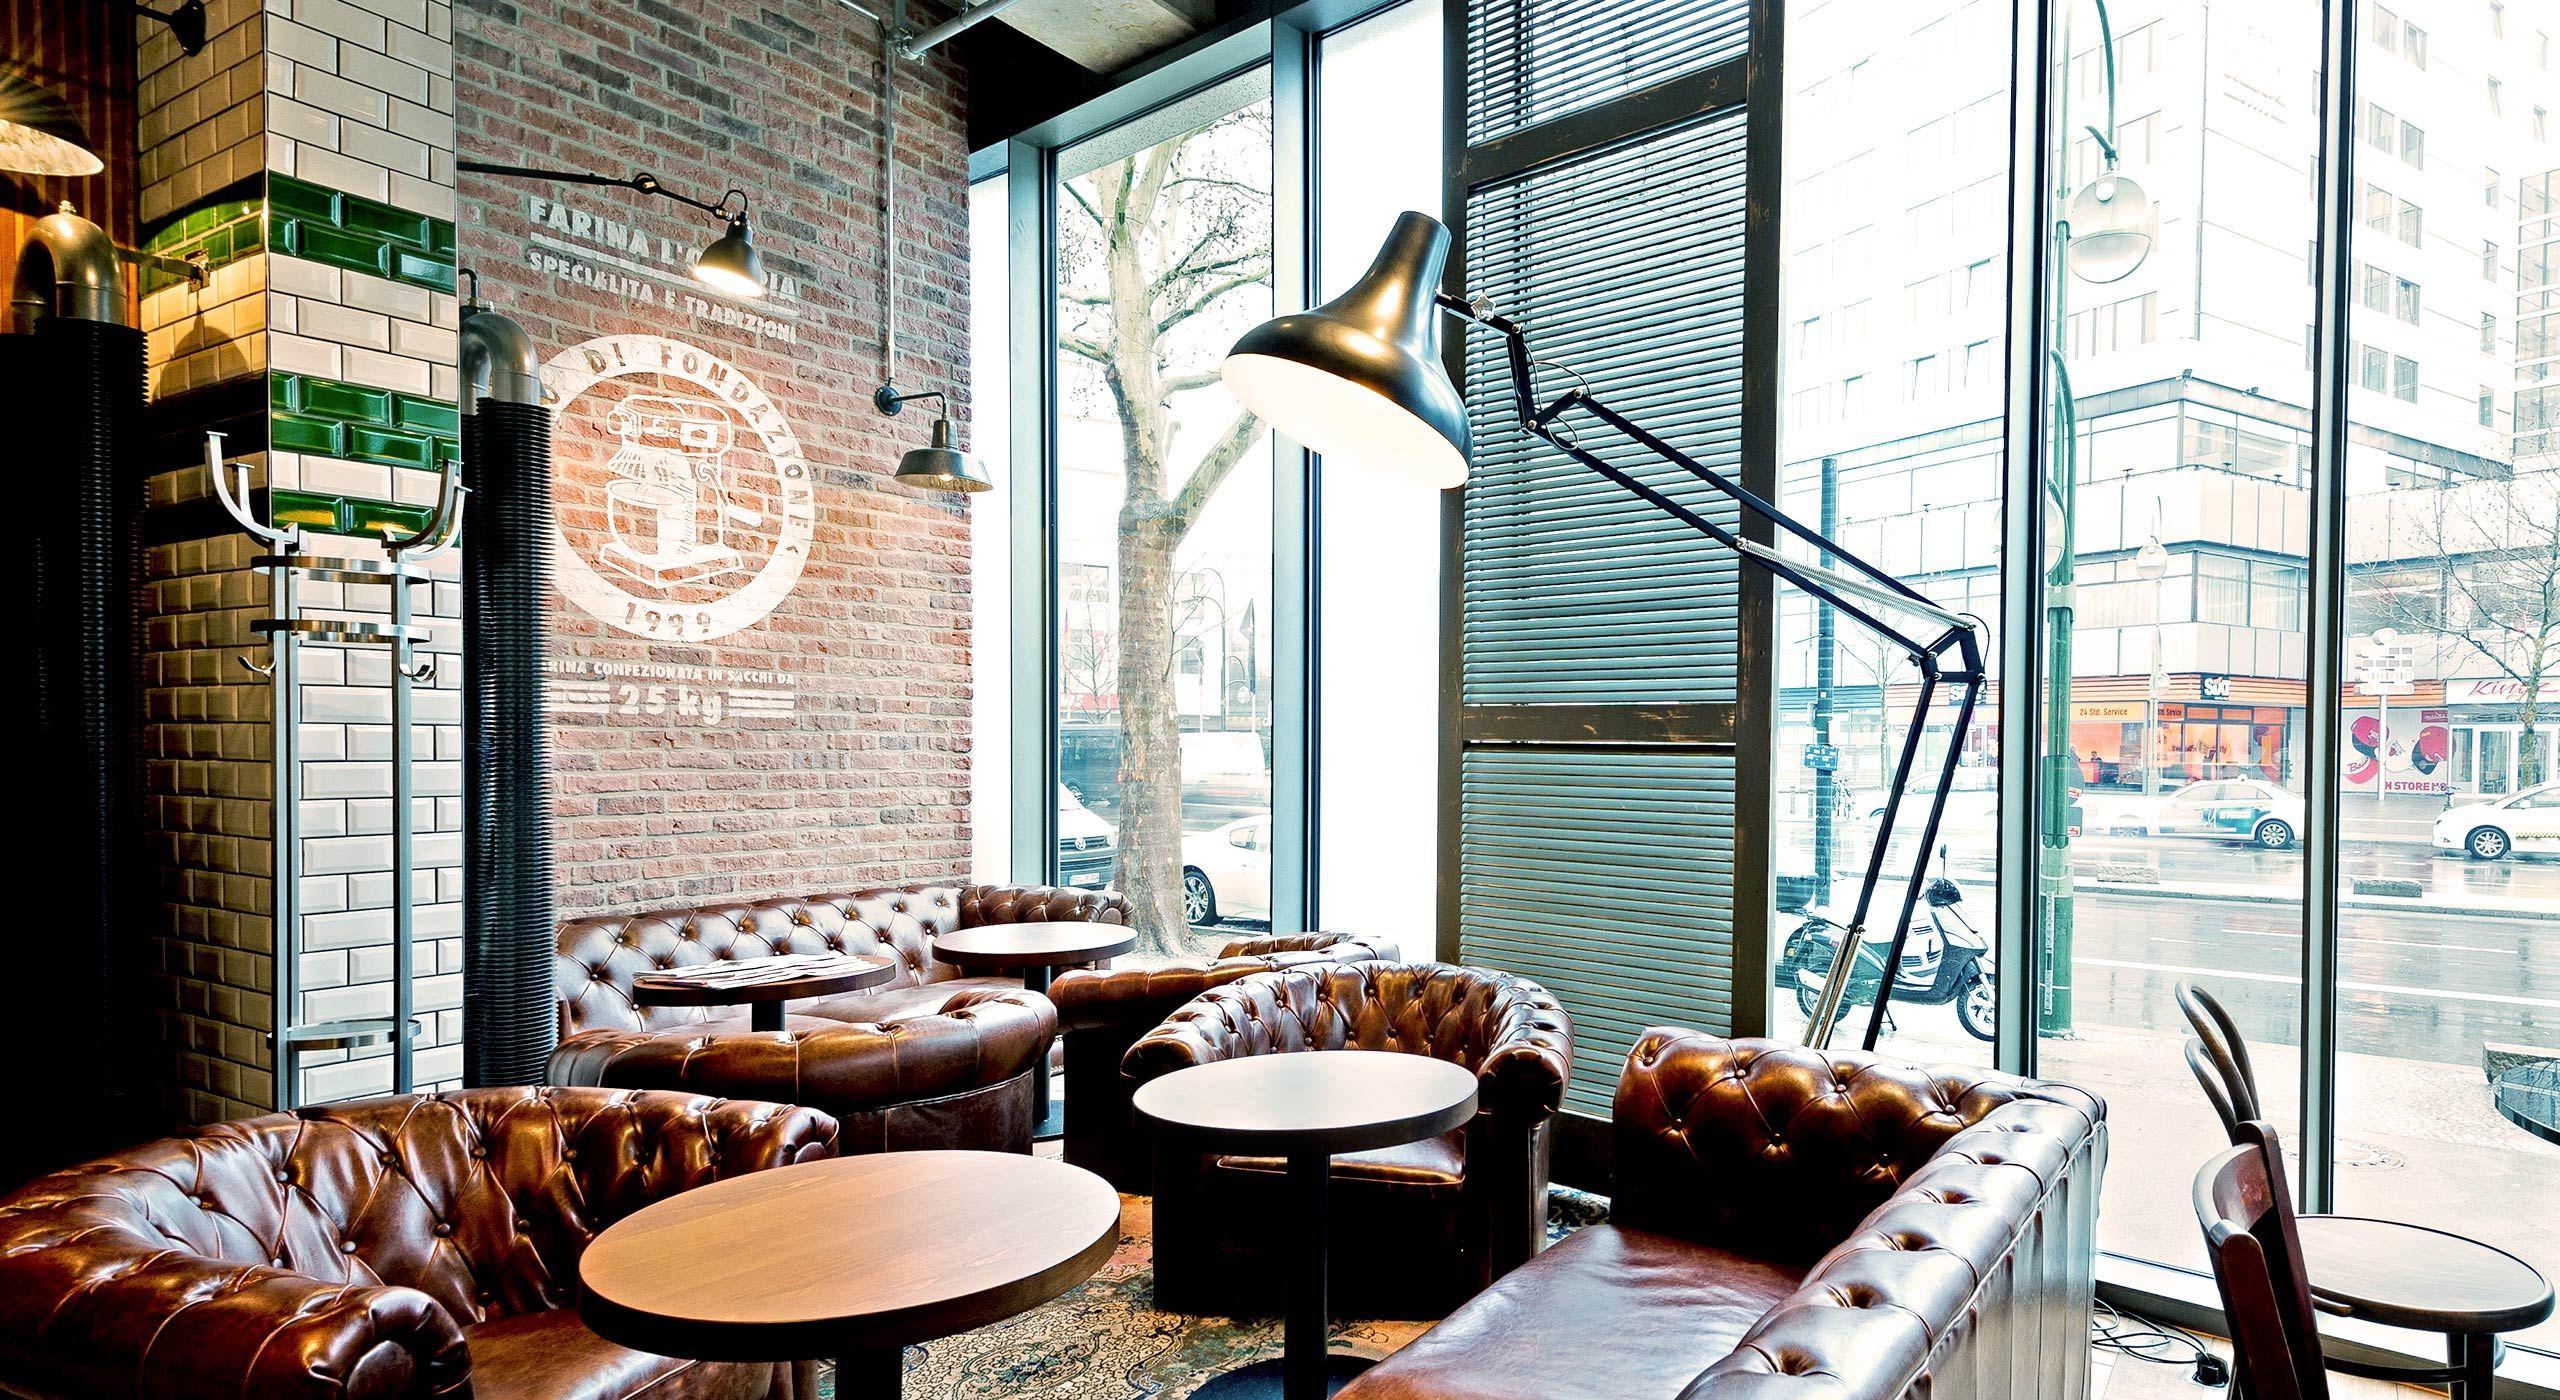 l 39 osteria interior design berlin ckm pinterest. Black Bedroom Furniture Sets. Home Design Ideas